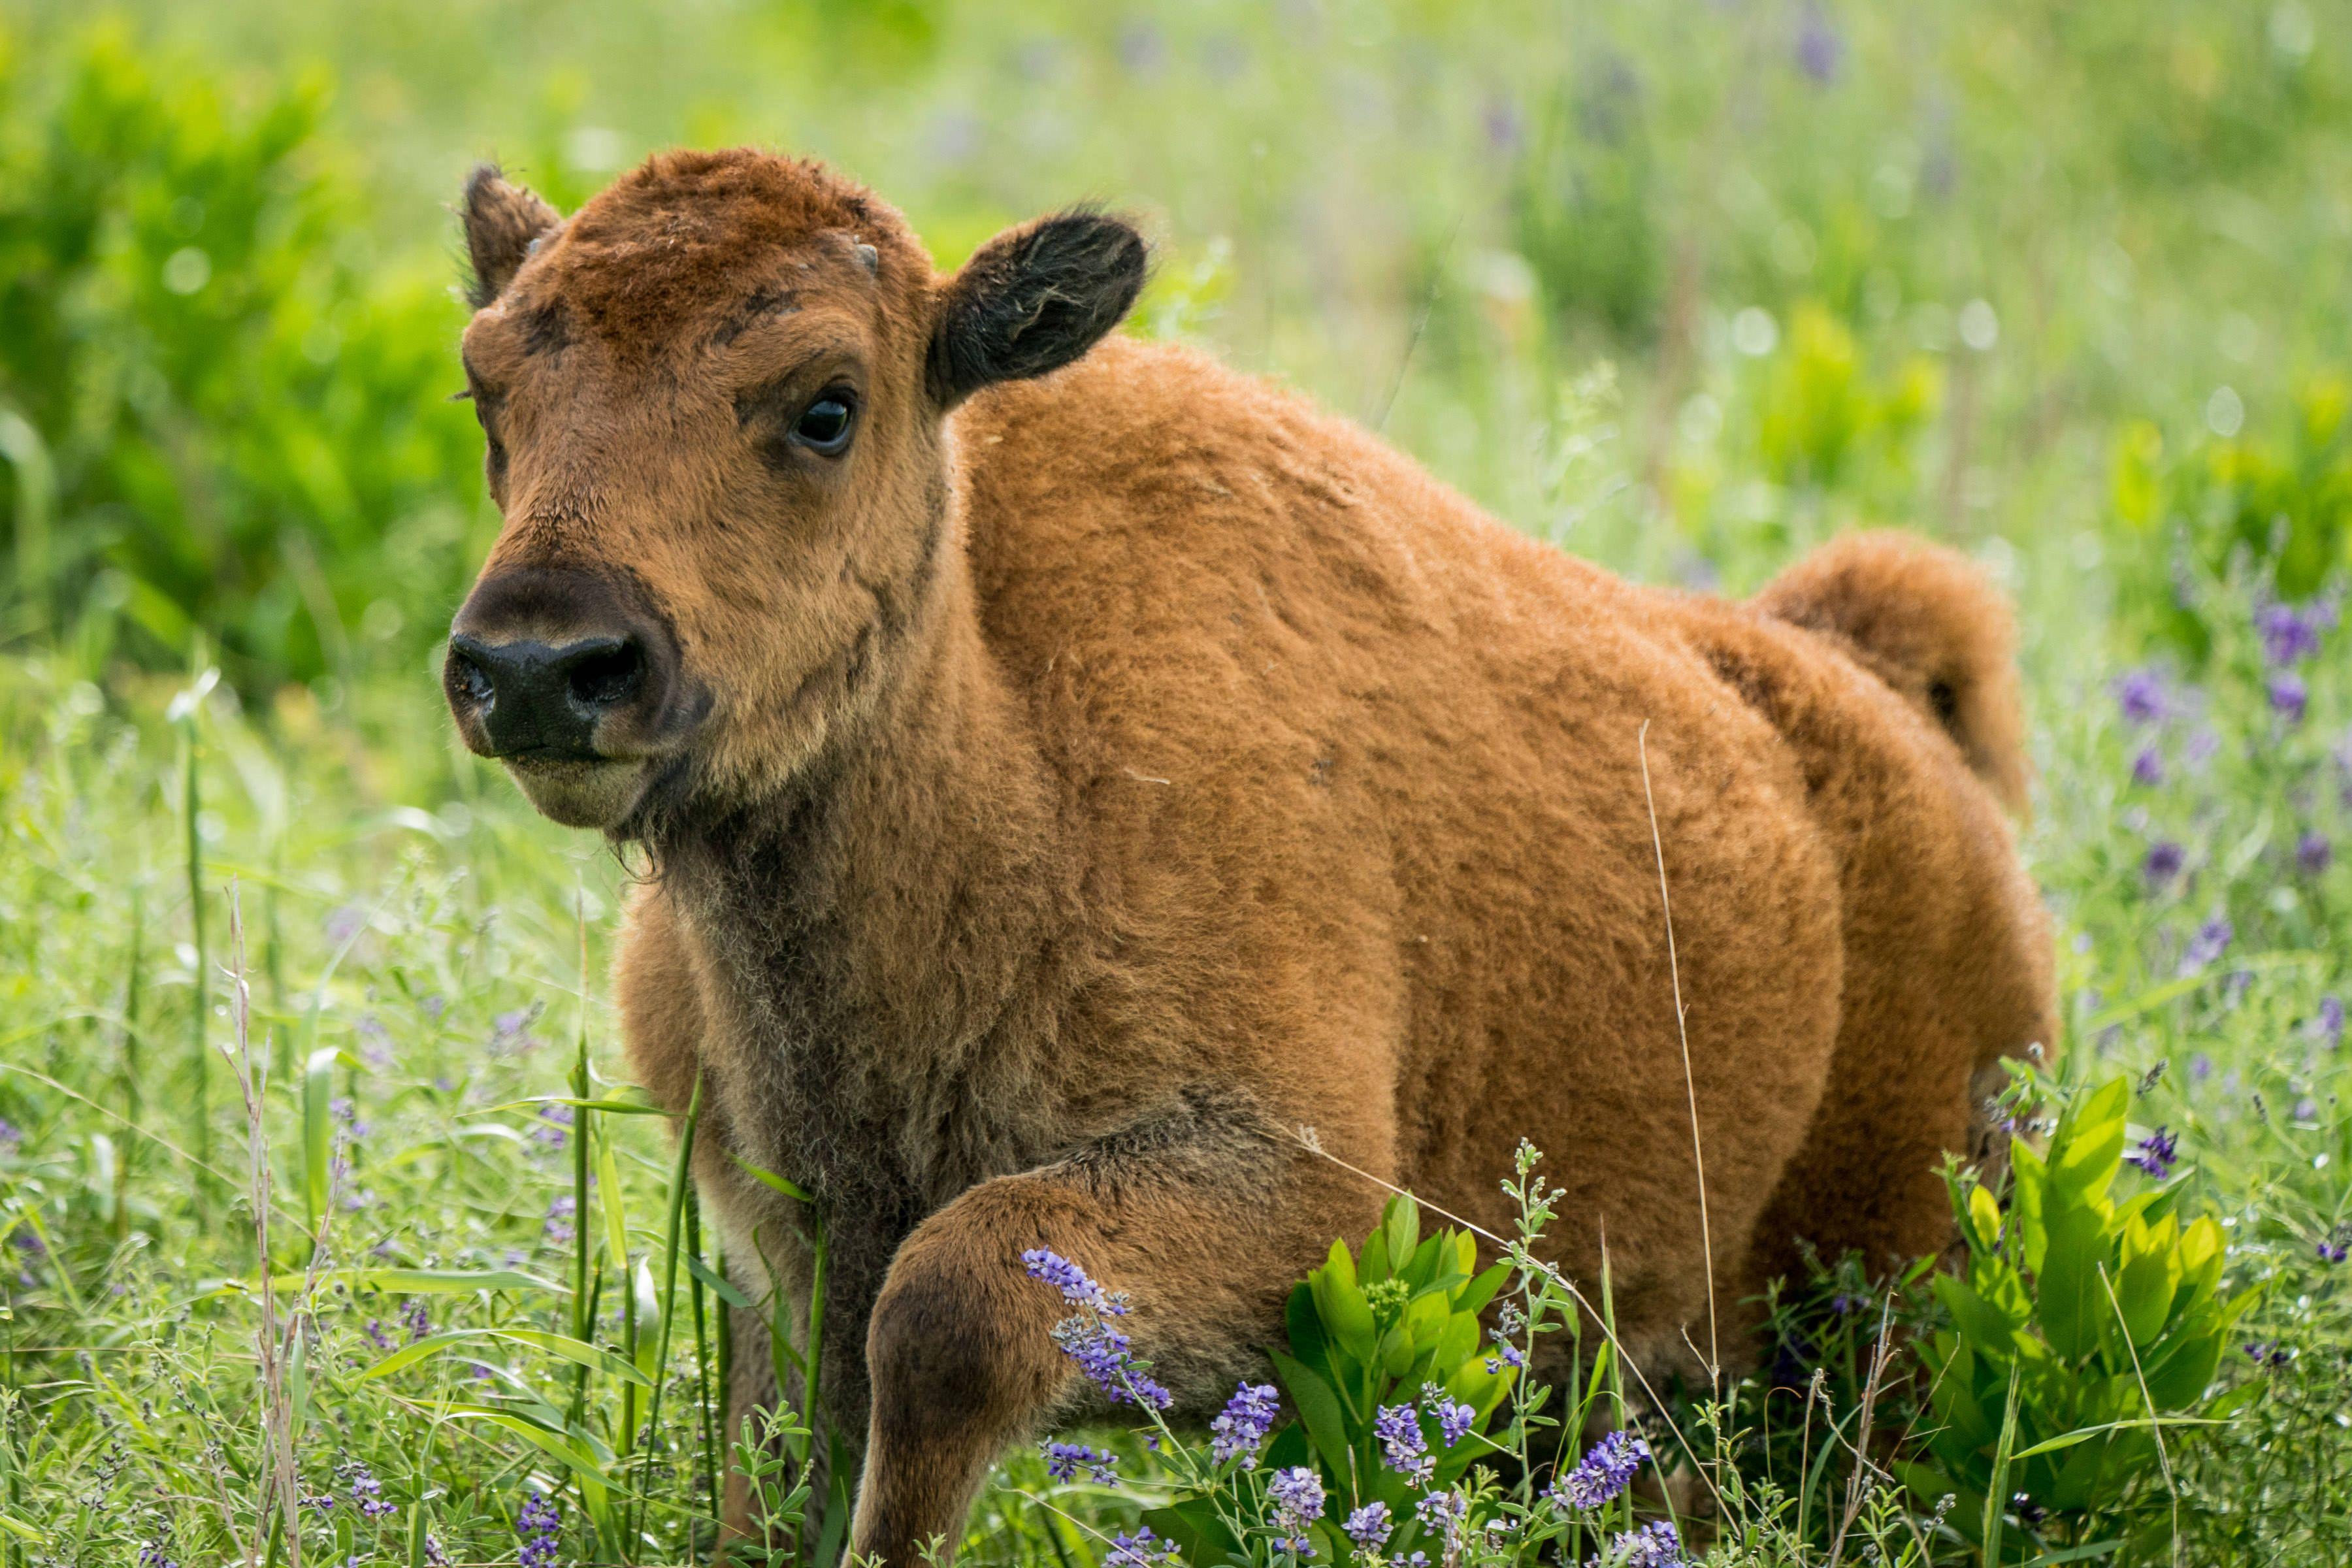 Bison calf standing in tallgrass.